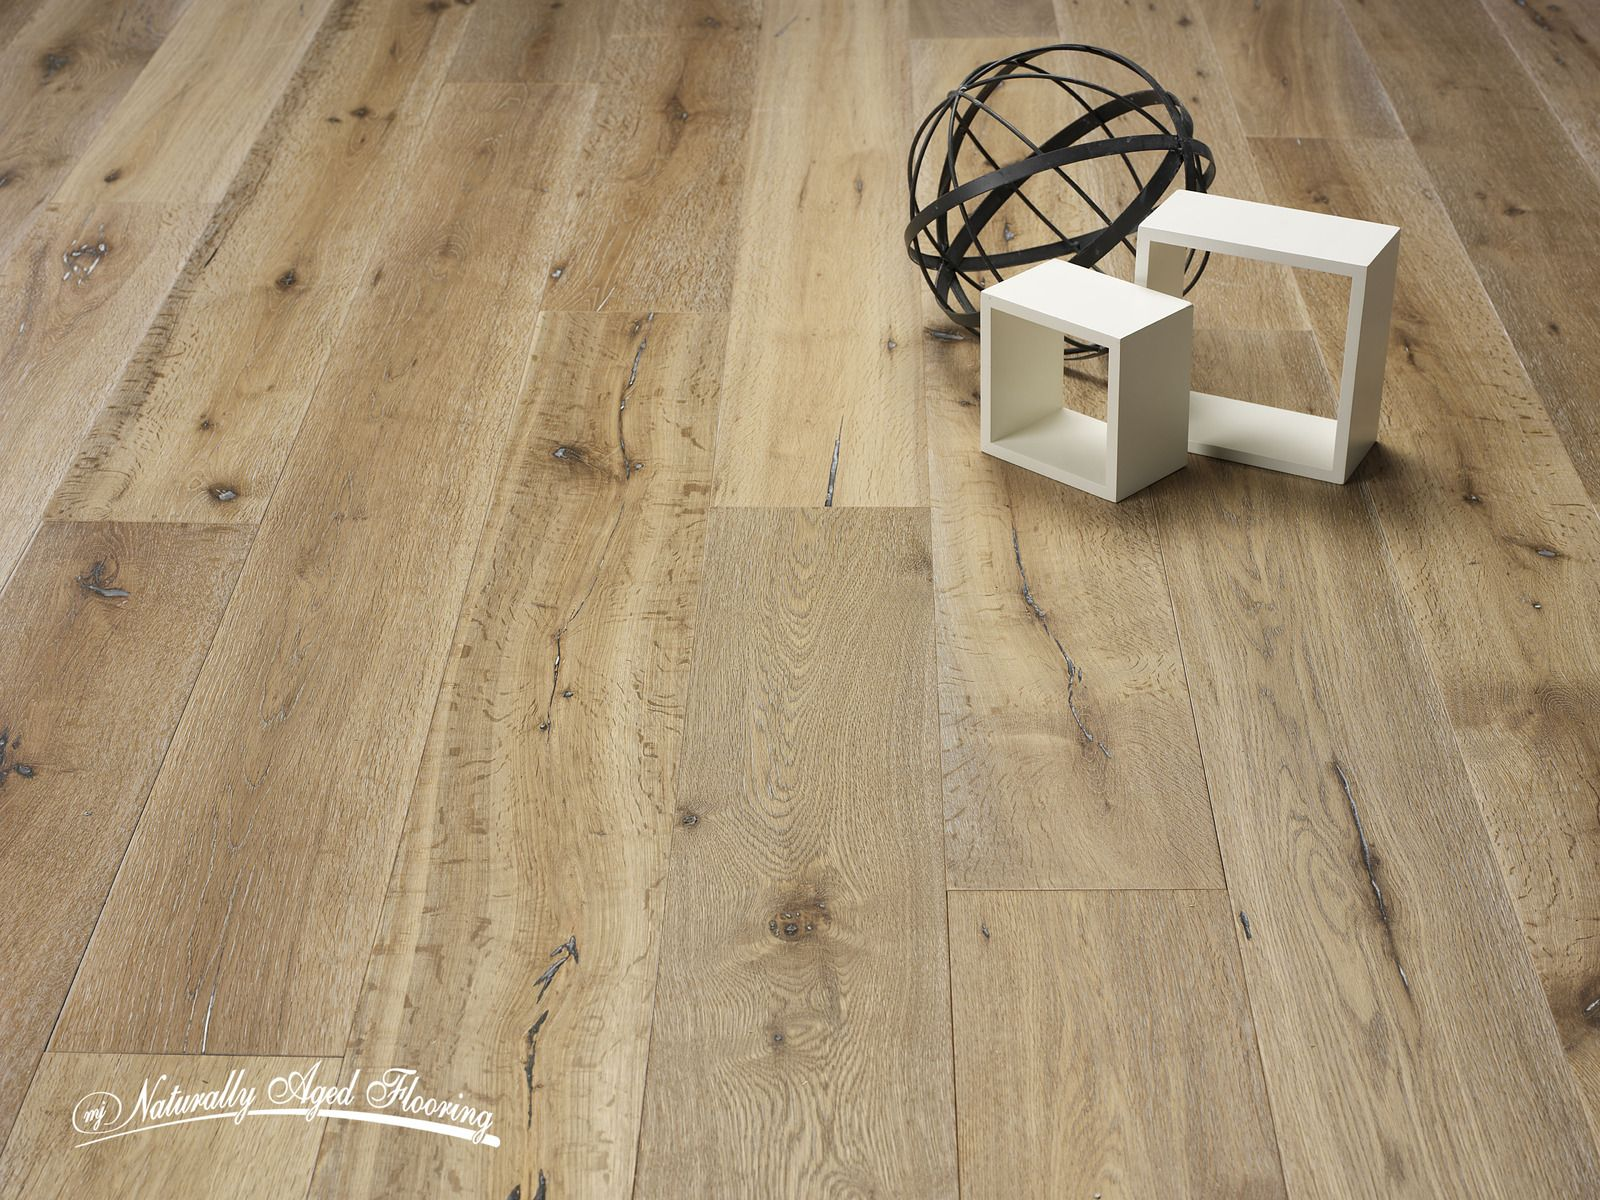 Naturally Aged Flooring Oak Medallion Collection Aspen Hills - Medallion flooring distributor